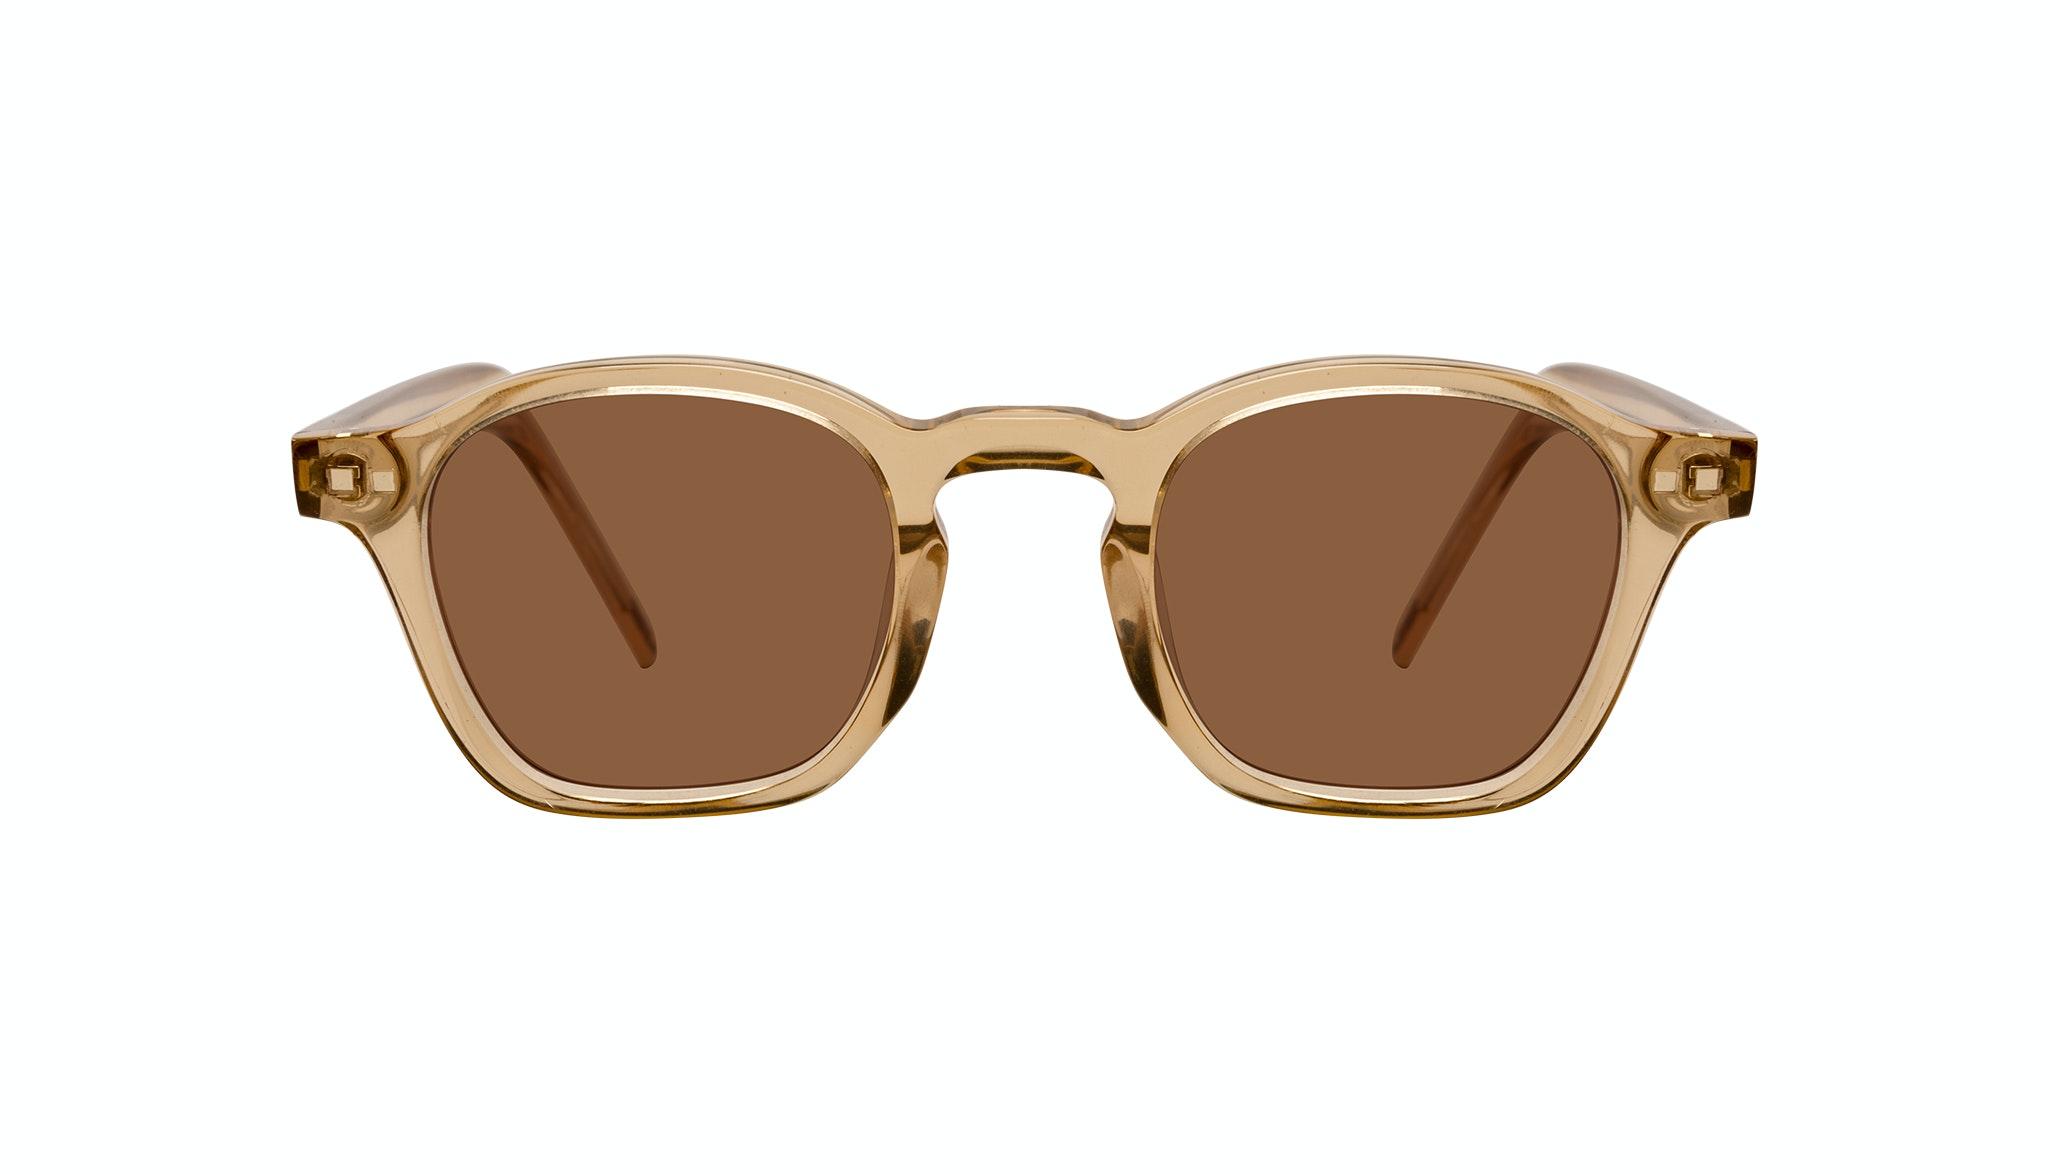 Affordable Fashion Glasses Square Sunglasses Men Brisk Golden Front